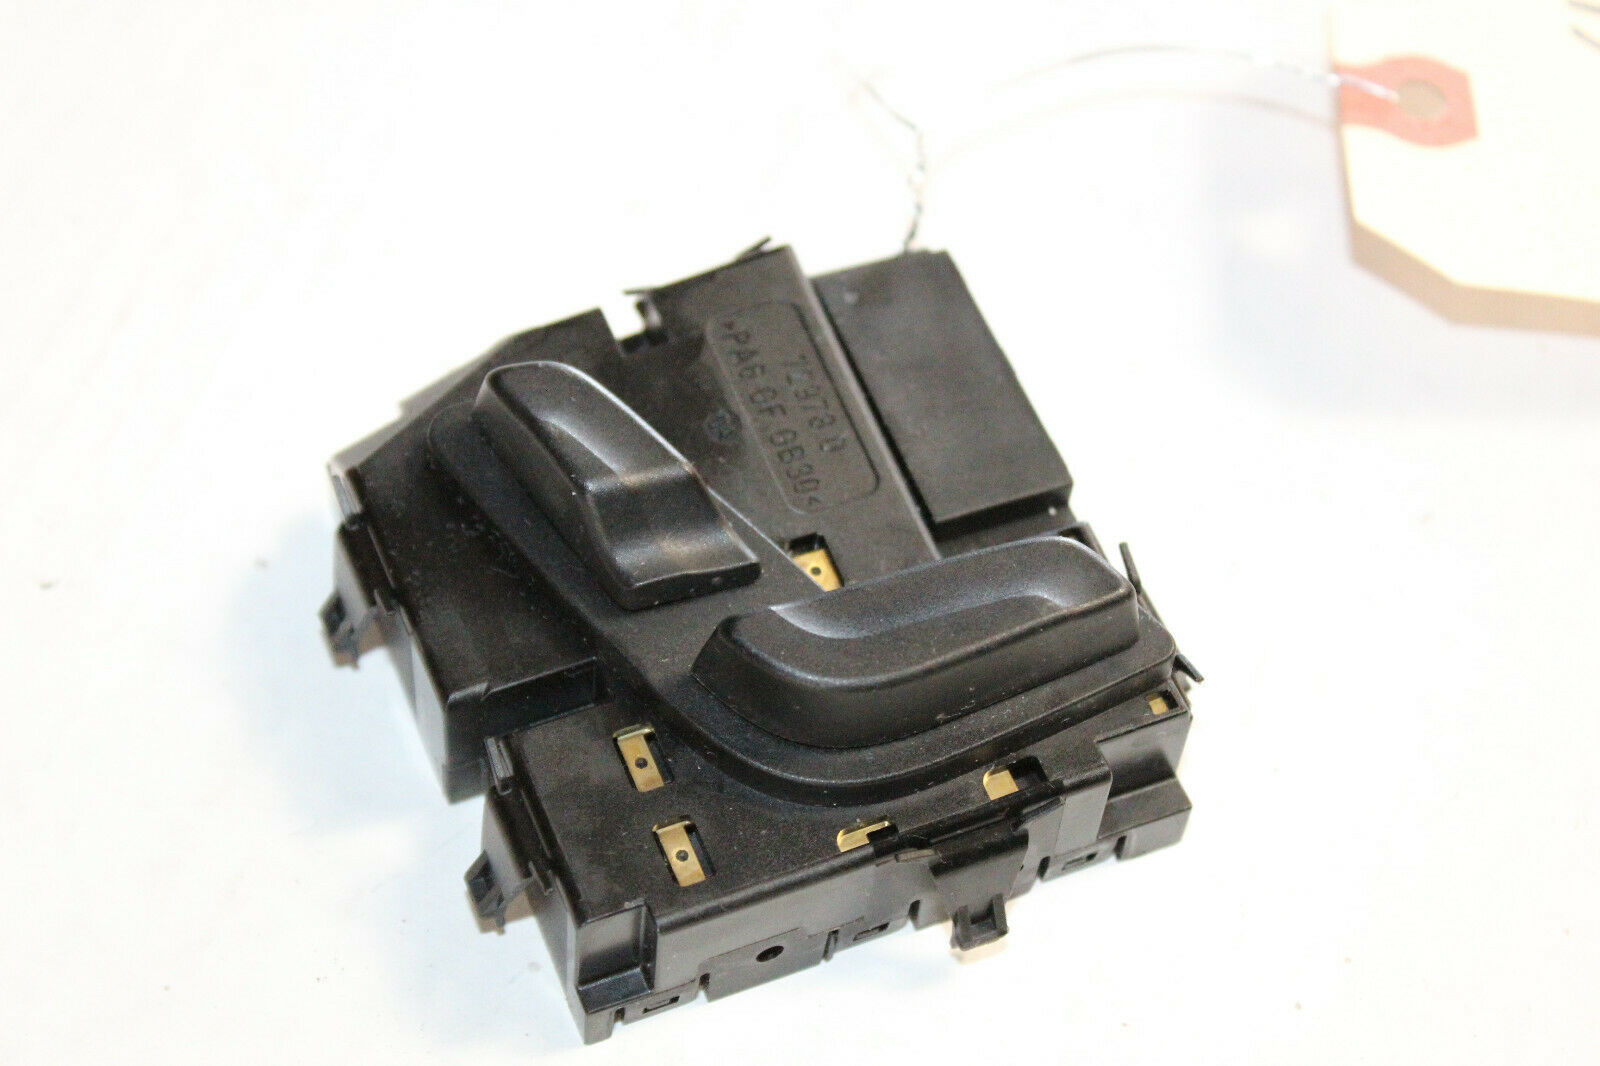 2008-2011 MERCEDES C300 W204 FRONT RIGHT PASSENGER SEAT ADJUSTMENT SWITCH J7878 - $34.29